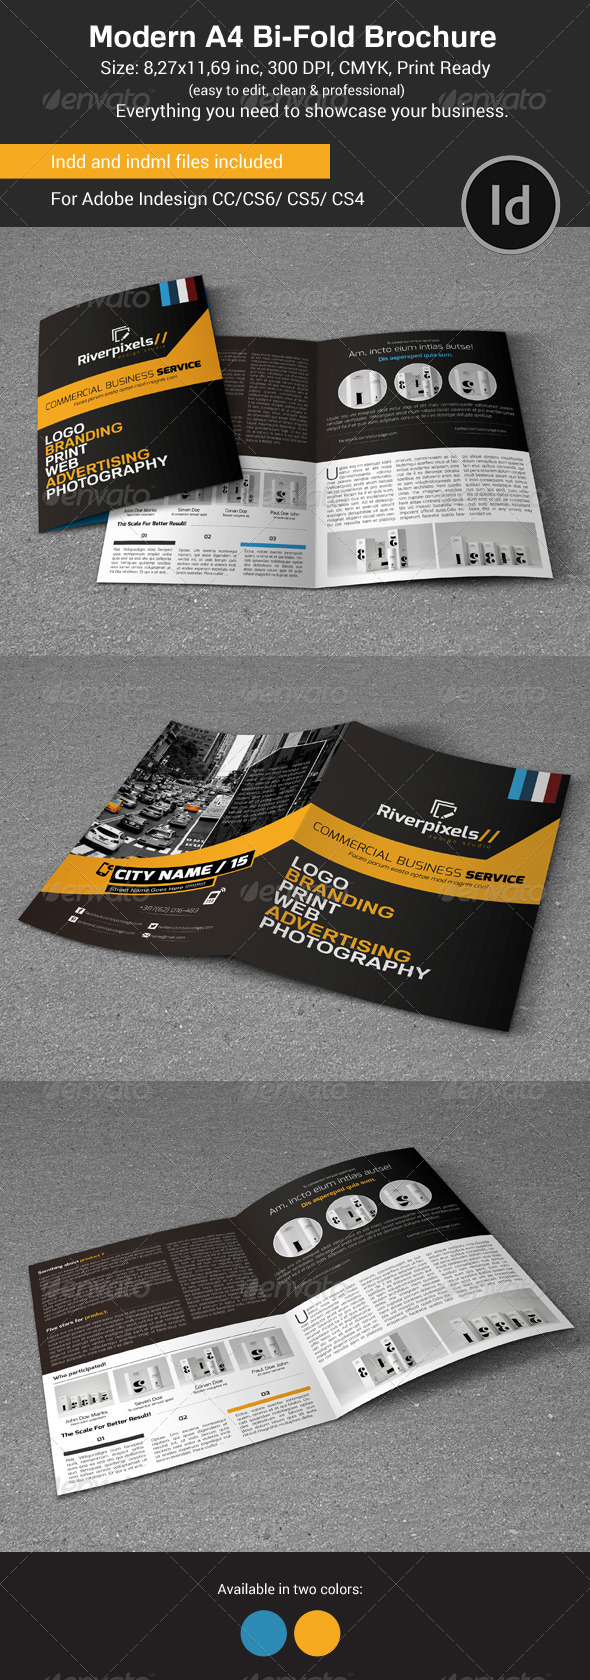 GraphicRiver Modern A4 Bi-Fold Brochure 8044269